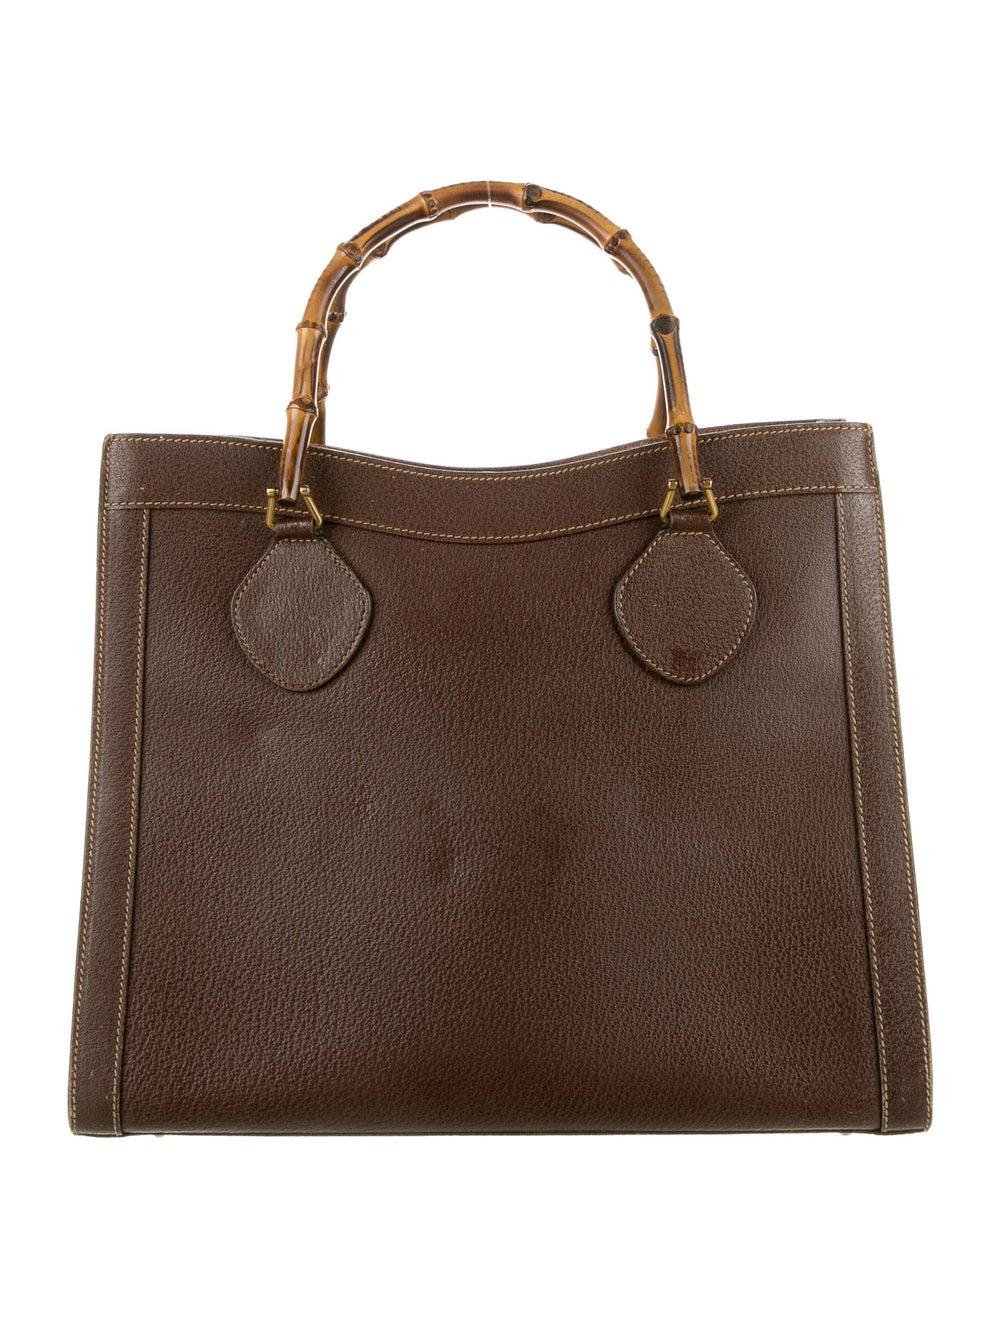 Gucci Vintage Diana Bamboo Tote Brown - image 4